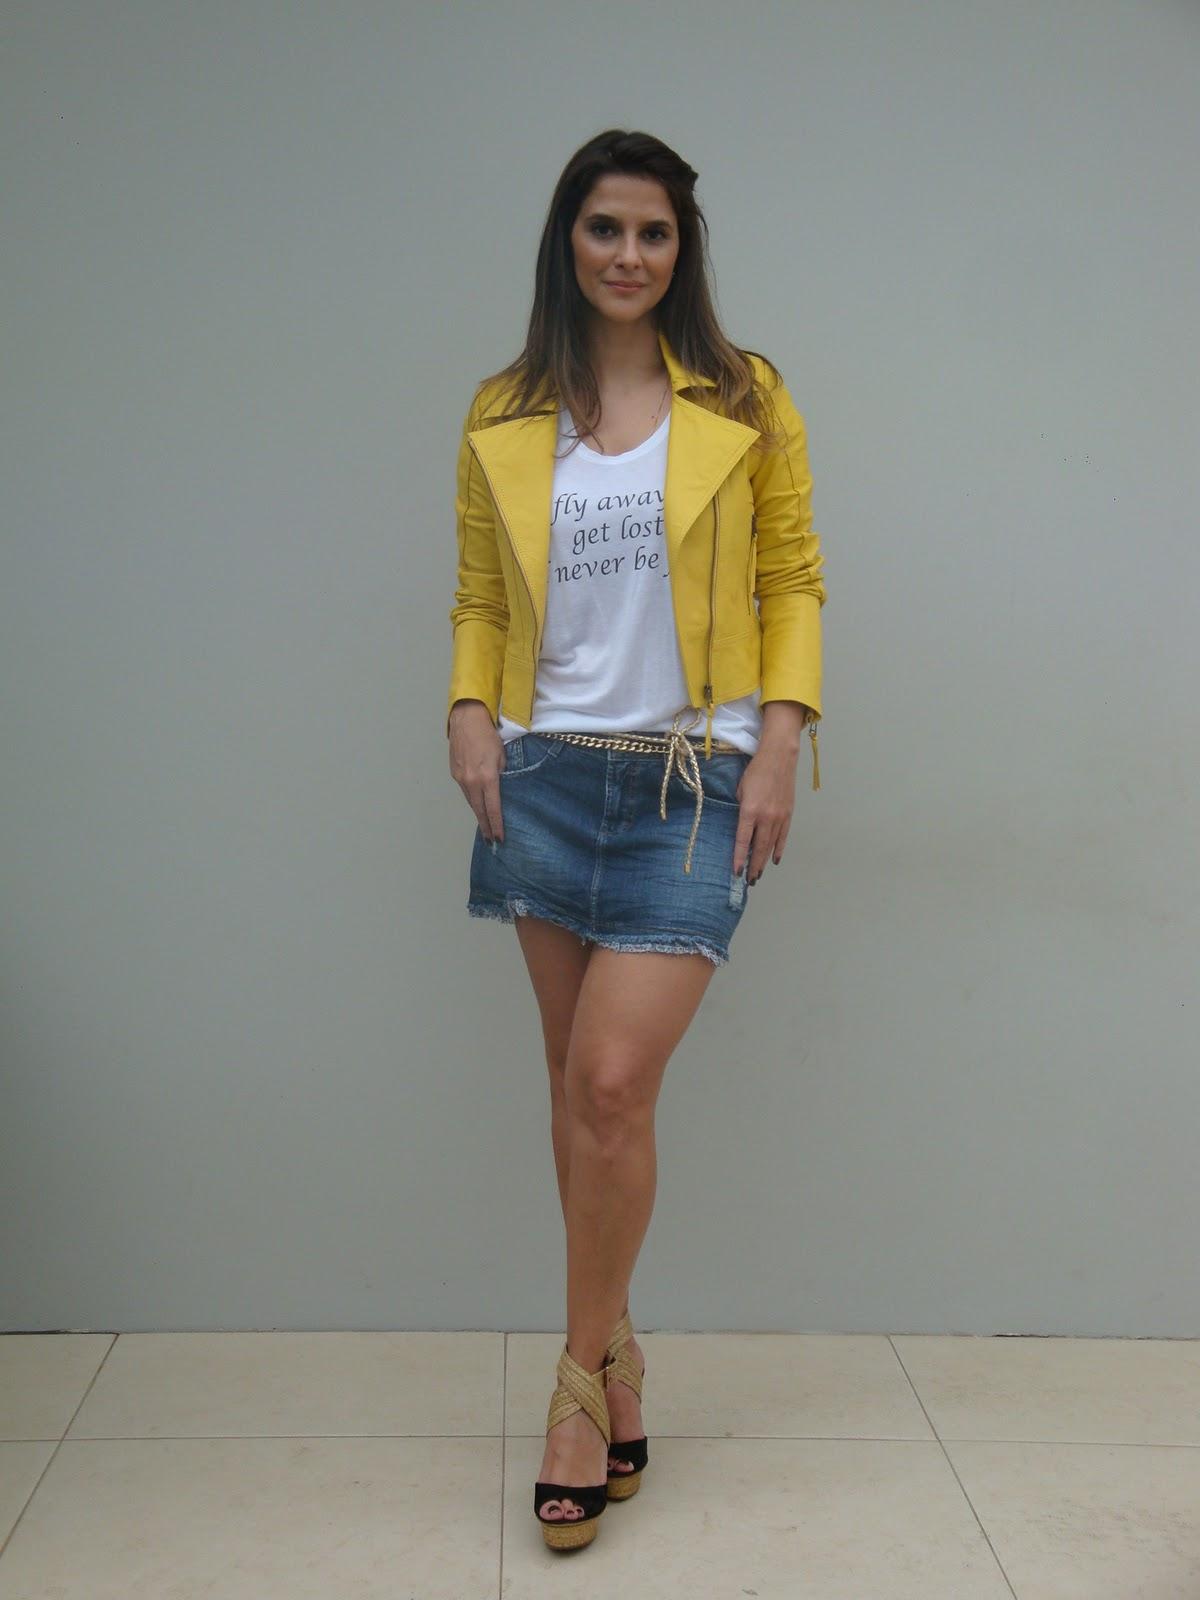 http://3.bp.blogspot.com/-rqr4wXzLi6w/T2OWeqbASEI/AAAAAAAAKs4/kOWiUVuvJ8s/s1600/jaqueta+couro+color+amarela.JPG